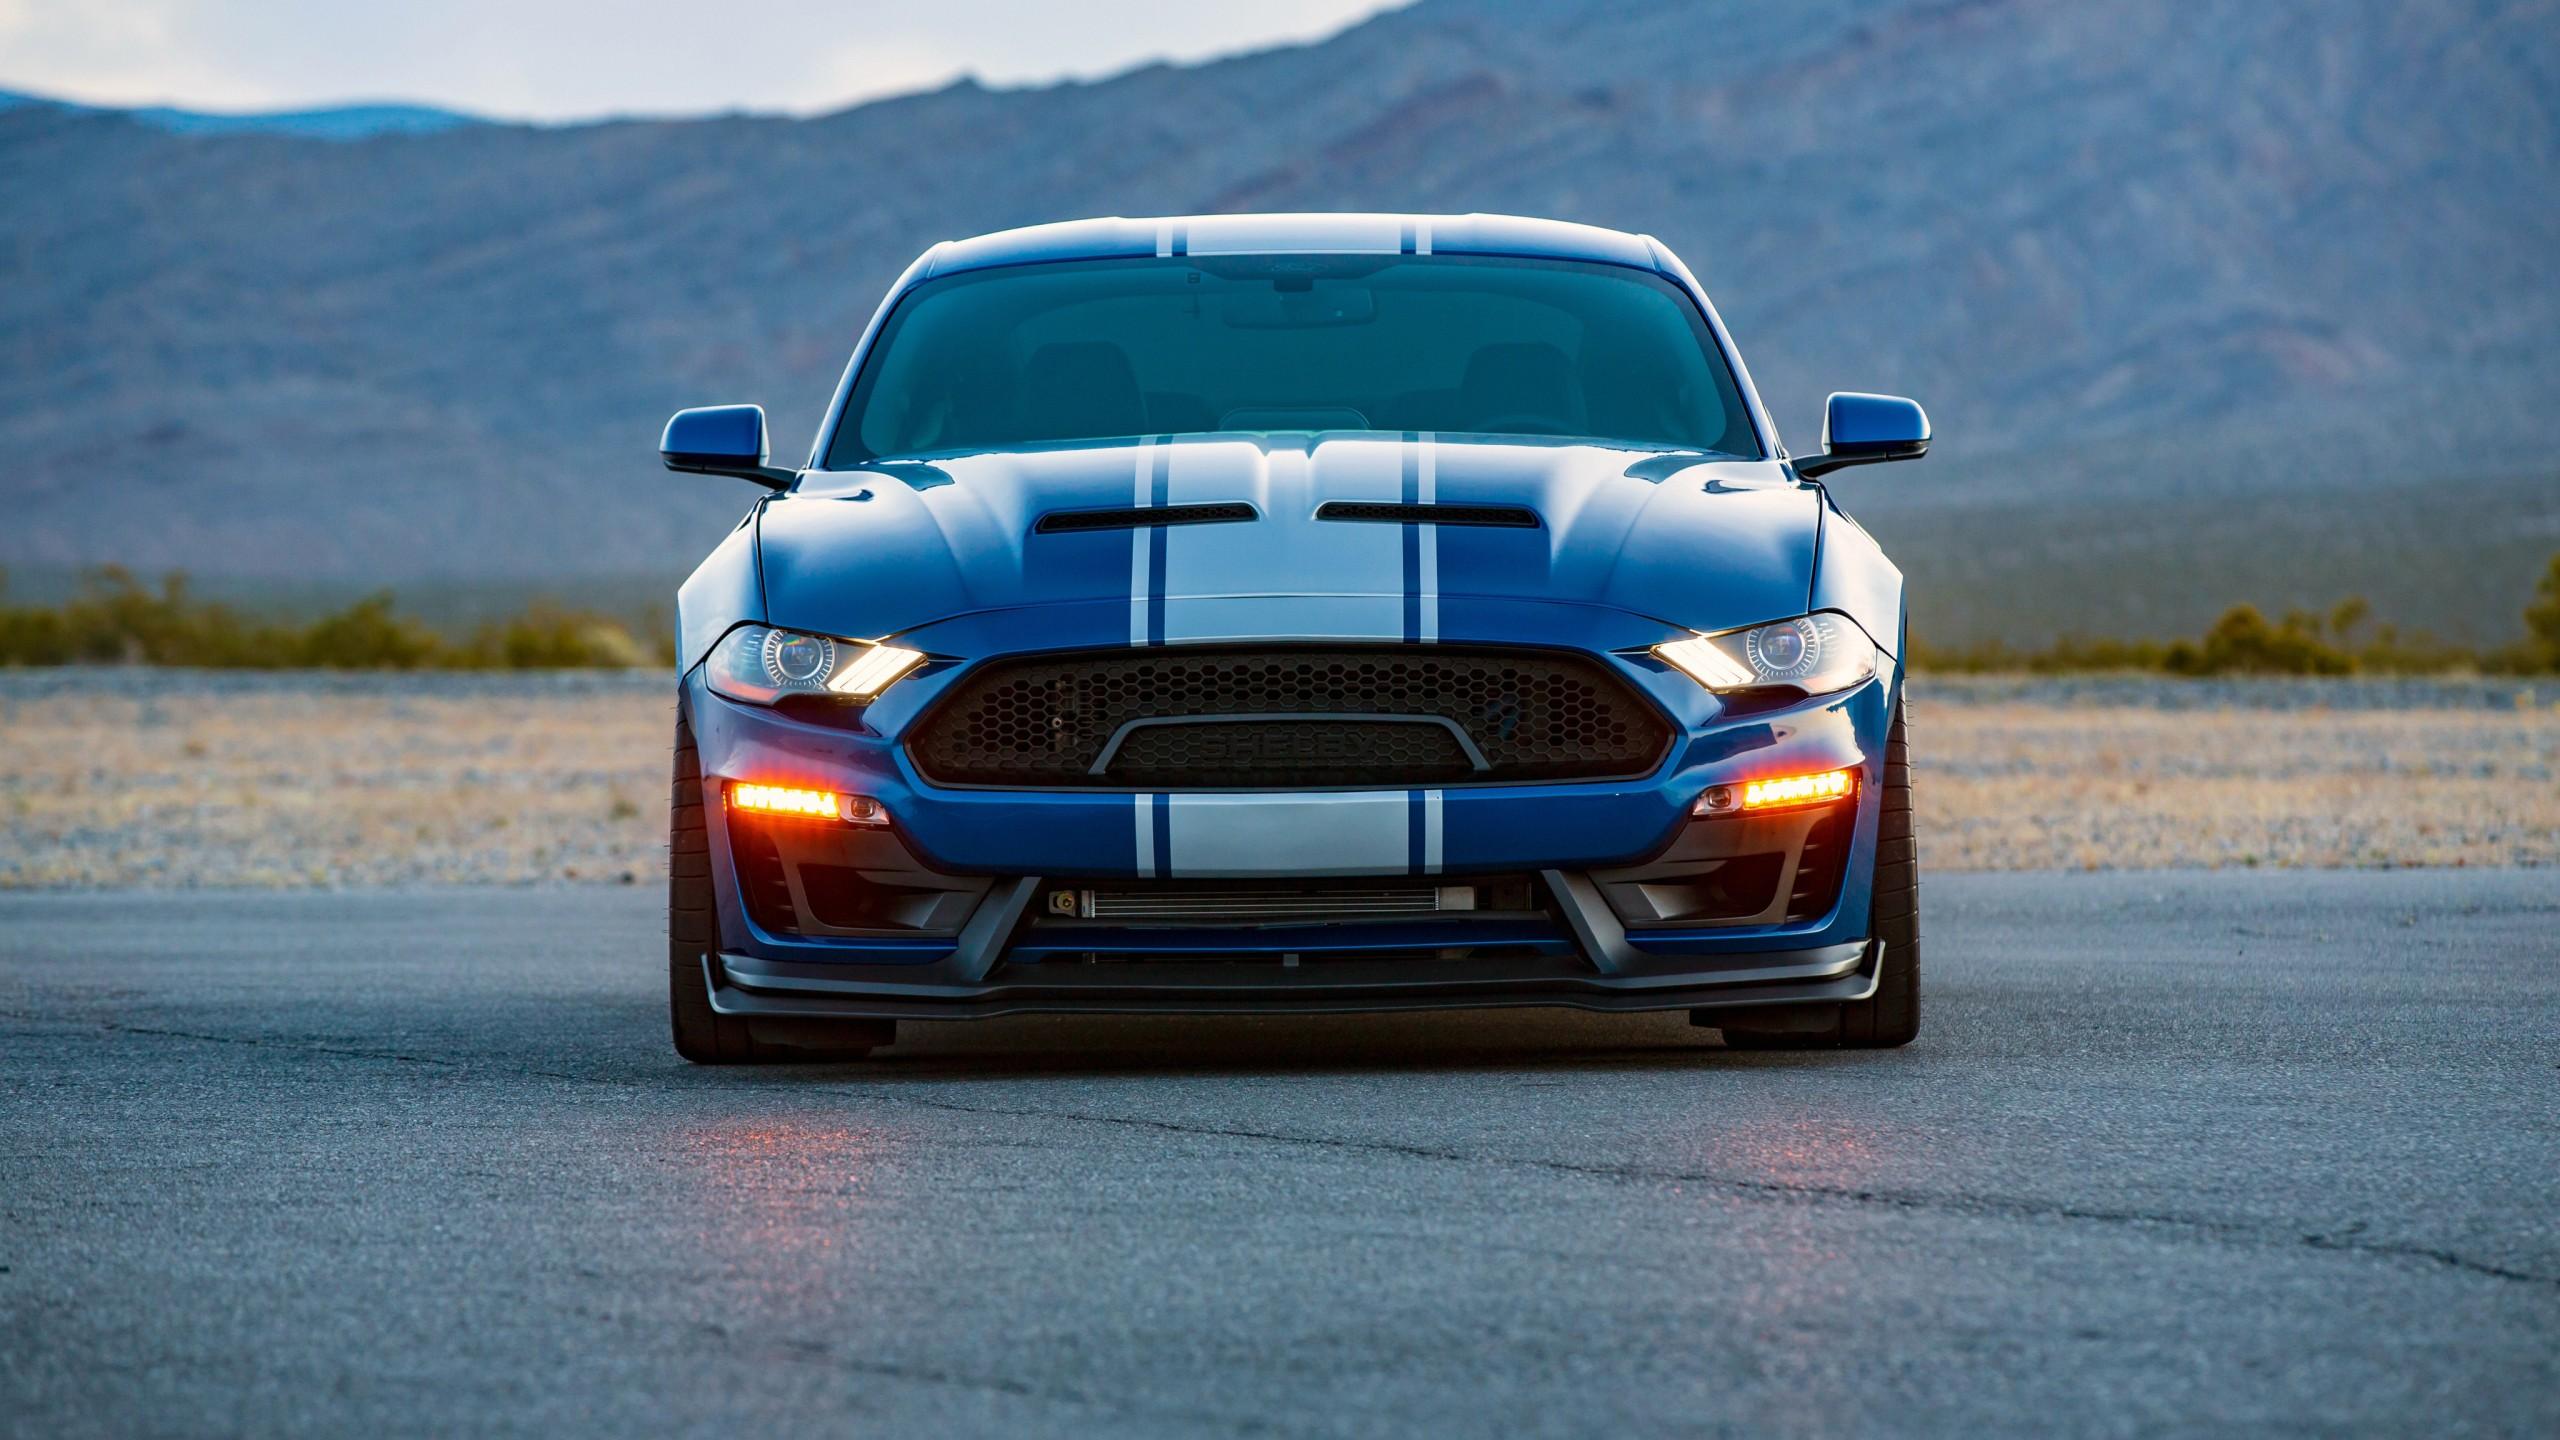 Mustang Car Wallpaper Download 2018 Shelby Super Snake Wide Body 4k Wallpaper Hd Car